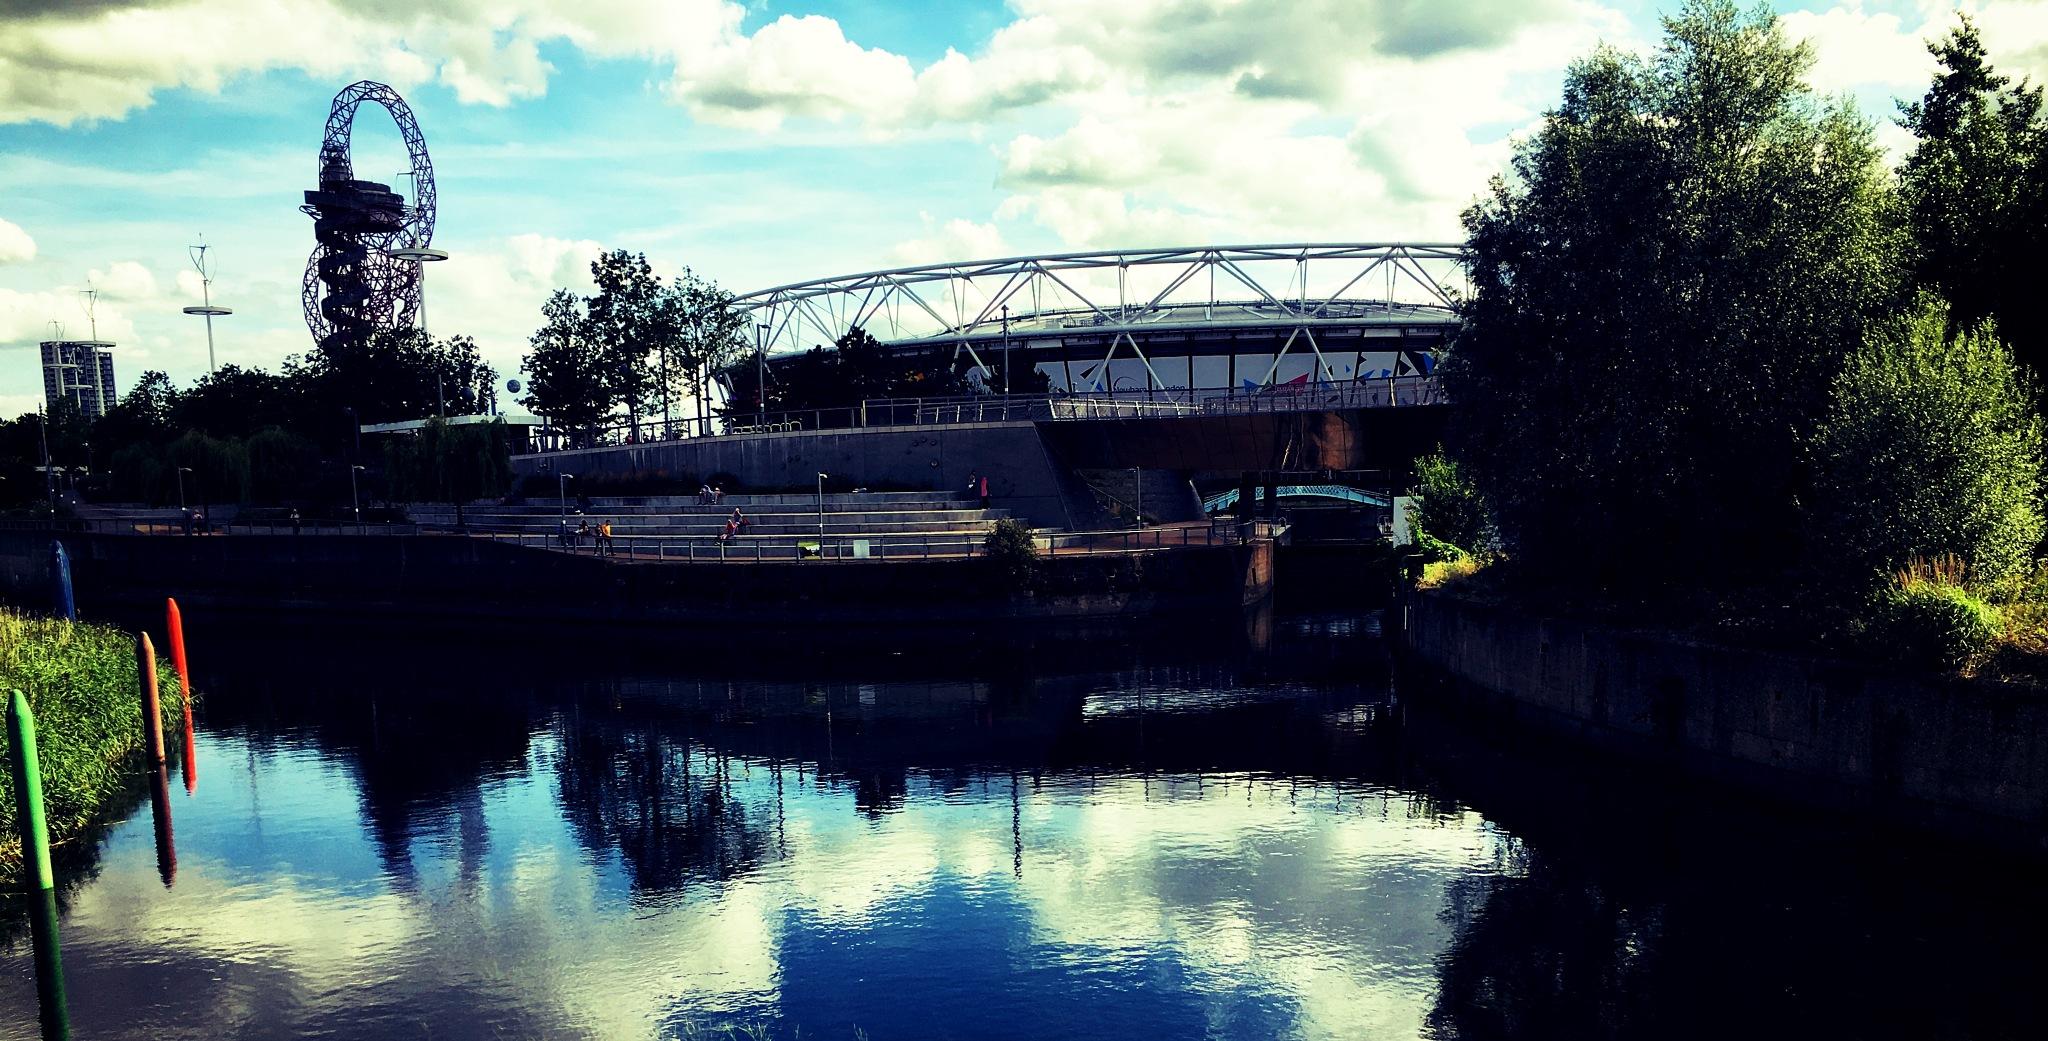 Orbit and London Stadium by Paul Stobbs